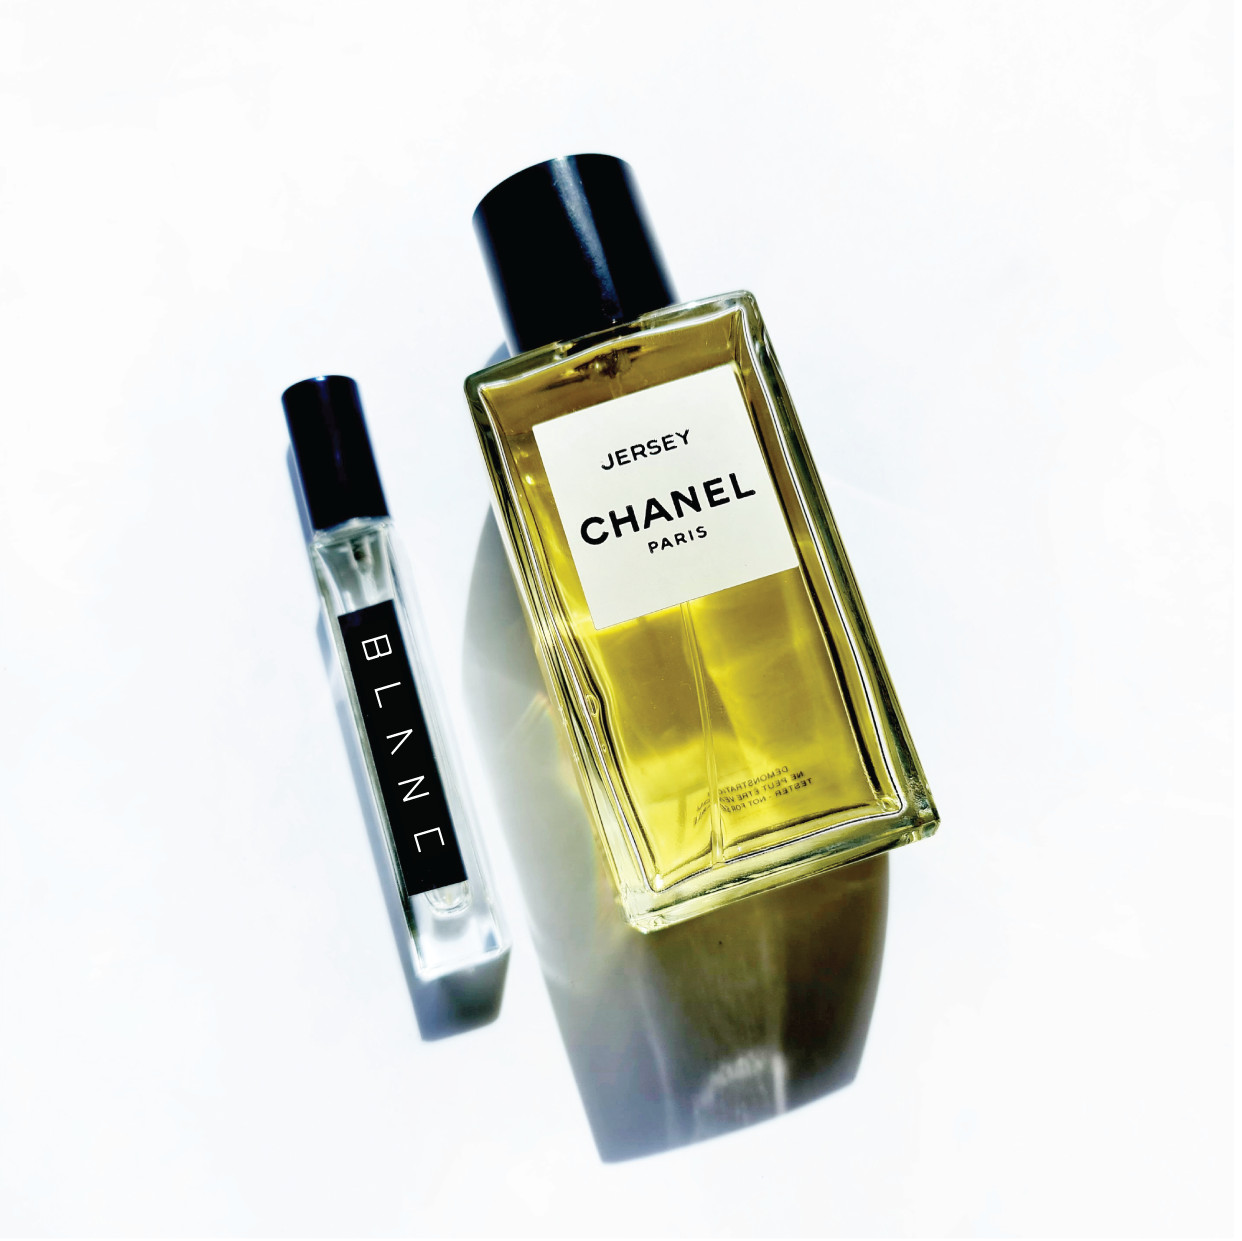 Chanel Jersey Les Exclusifs De Chanel EDT - Chiết 10ml